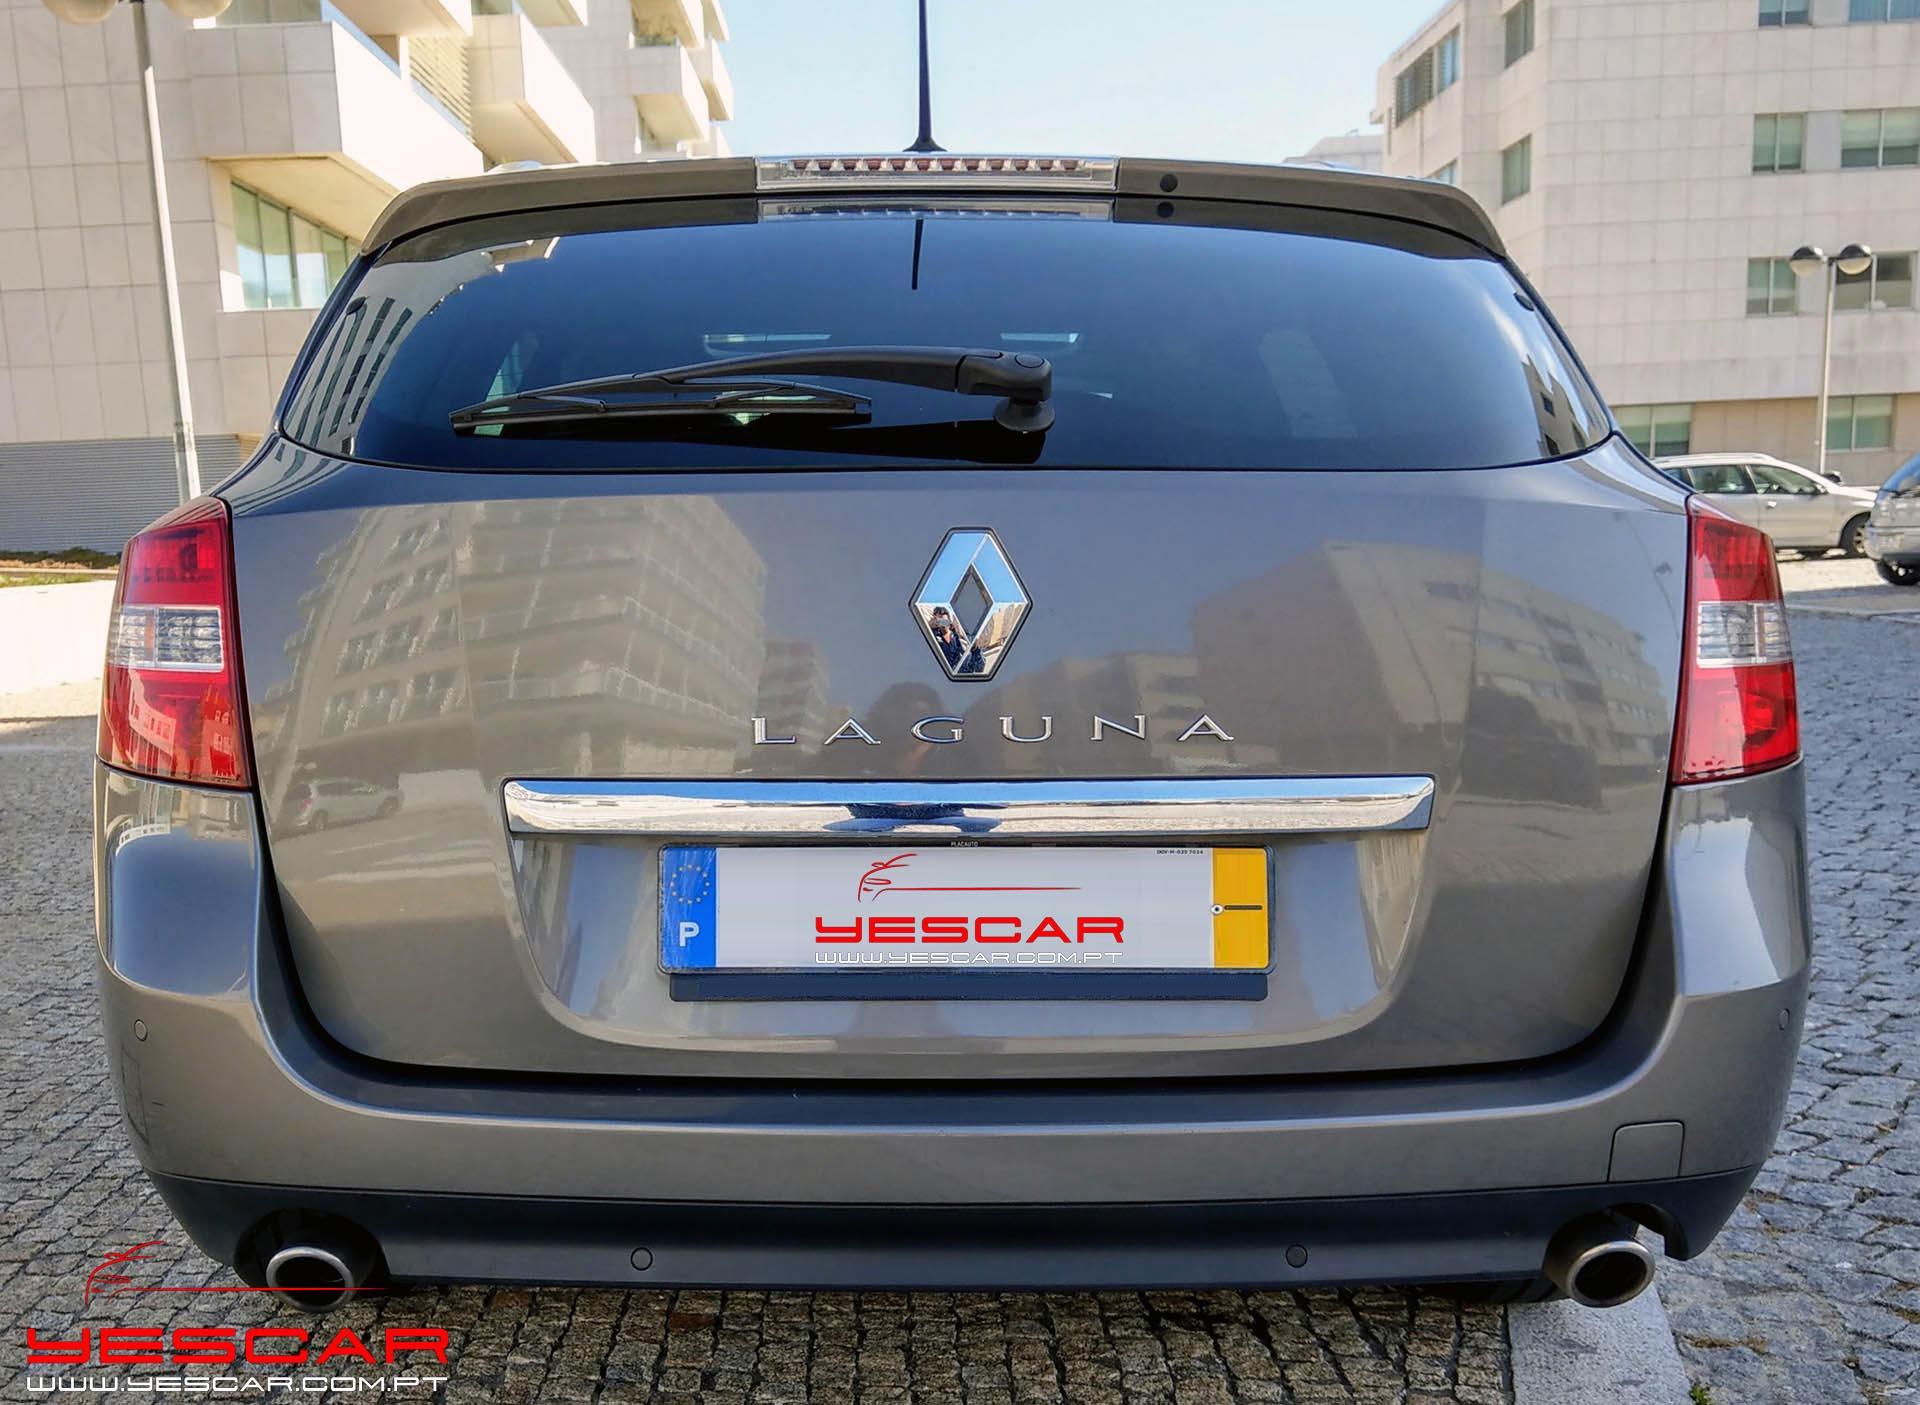 YESCAR_Renault_Laguna_SW (14)